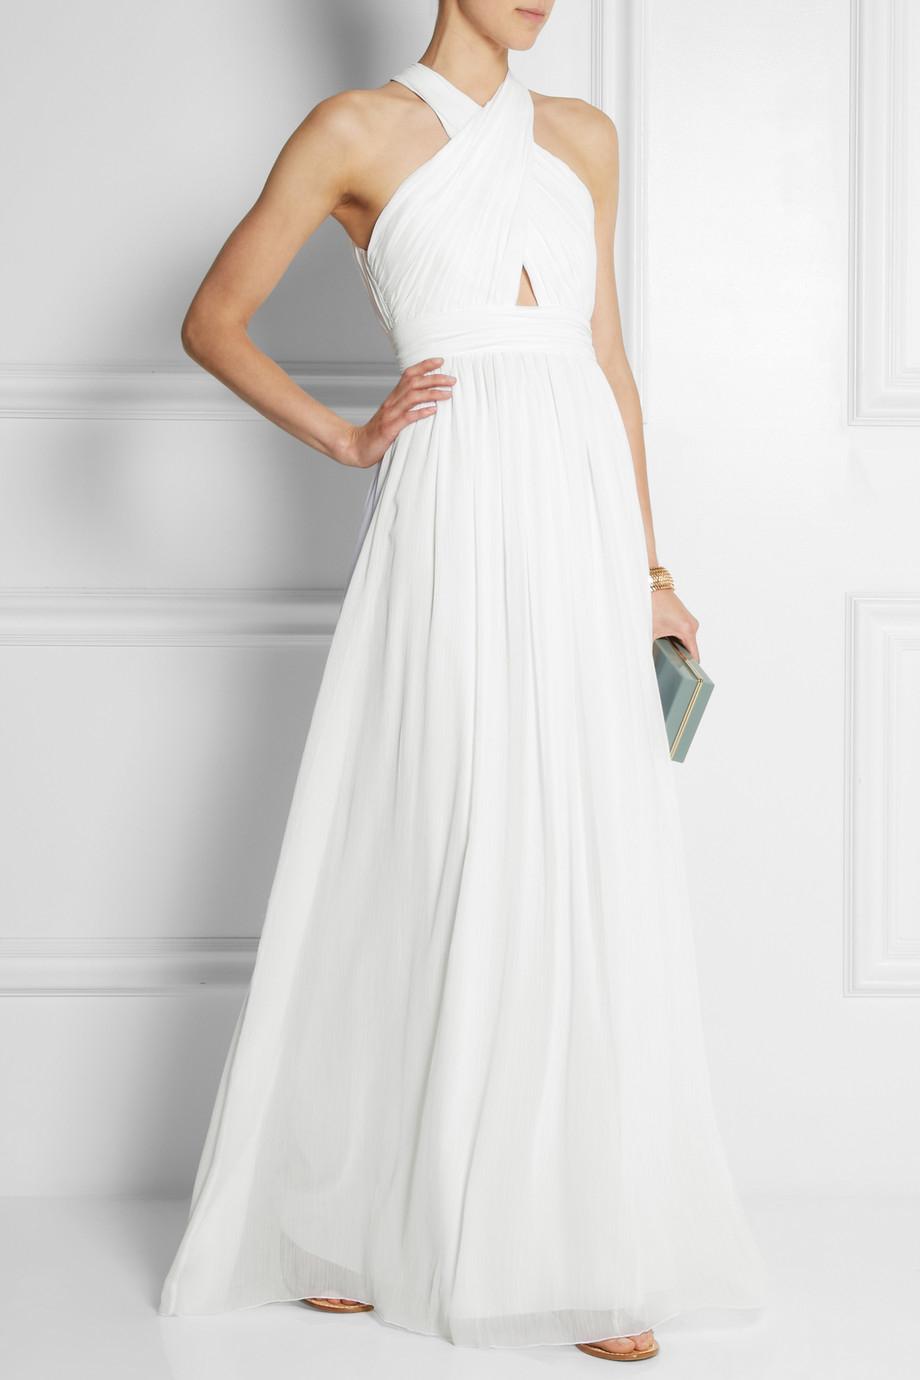 78cf3c6e62c3 Lyst - Alice + Olivia Jaelyn Cutout Chiffon Maxi Dress in White